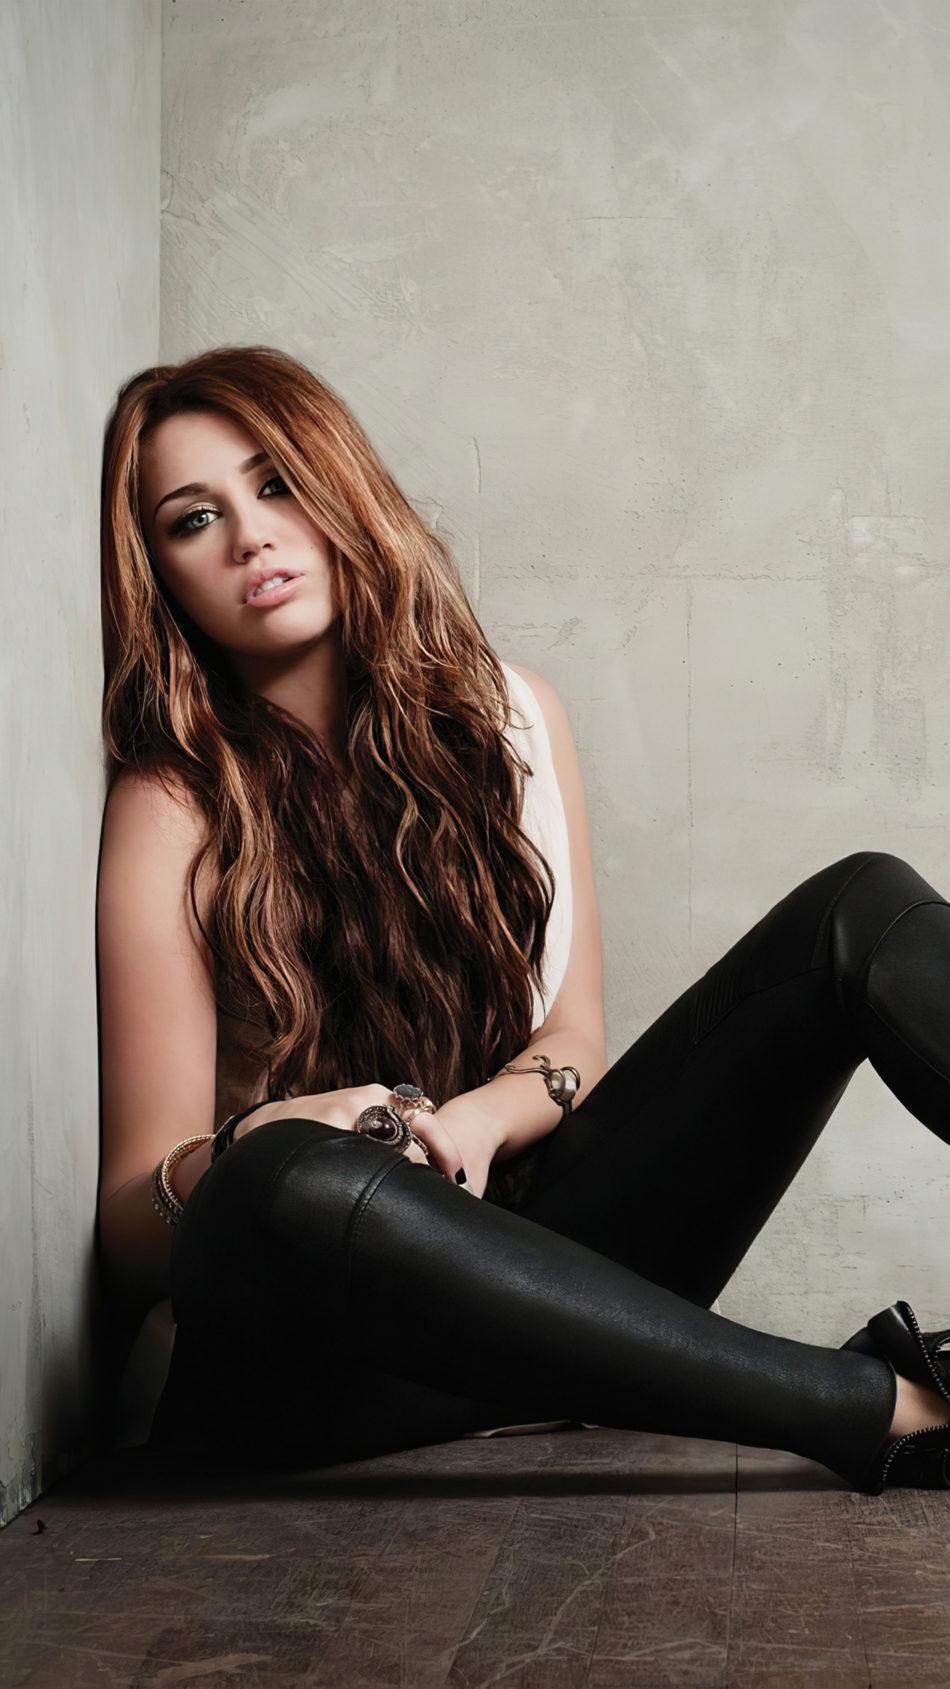 Miley Cyrus 2020 4K Ultra HD Mobile Wallpaper